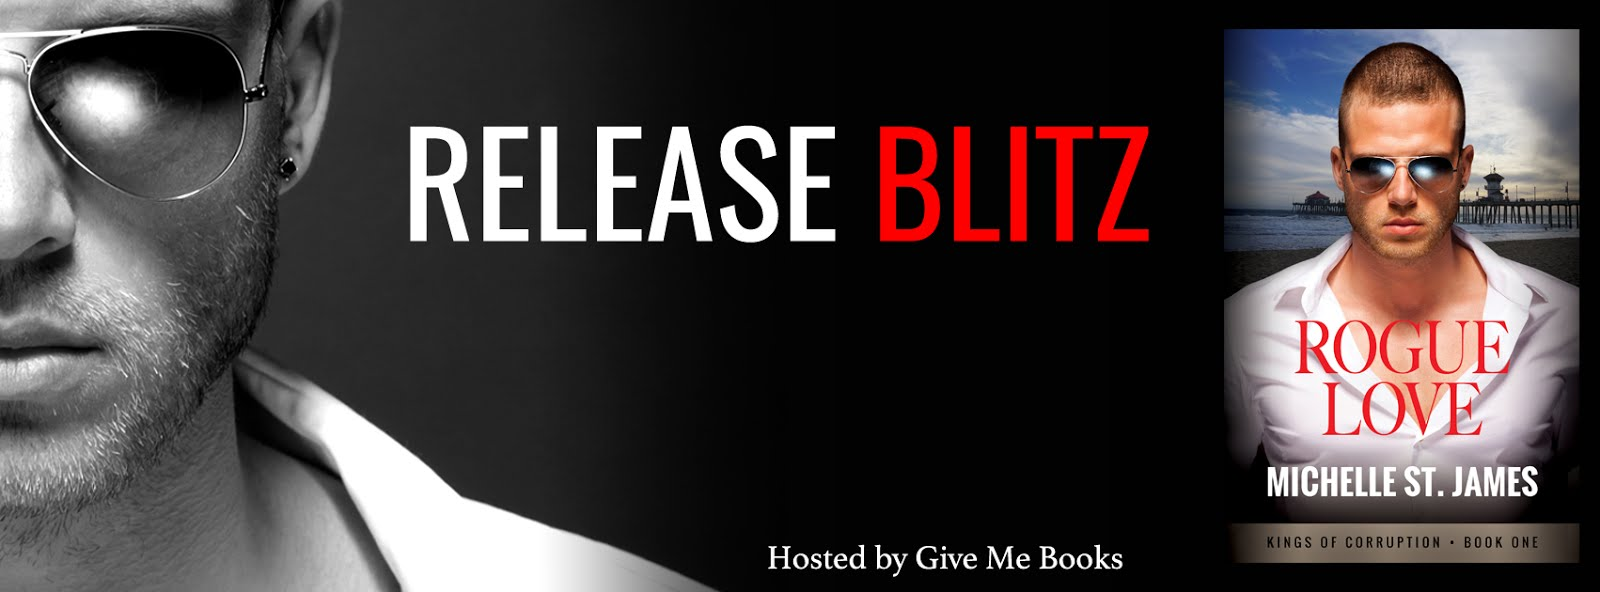 Rogue Love Release Blitz